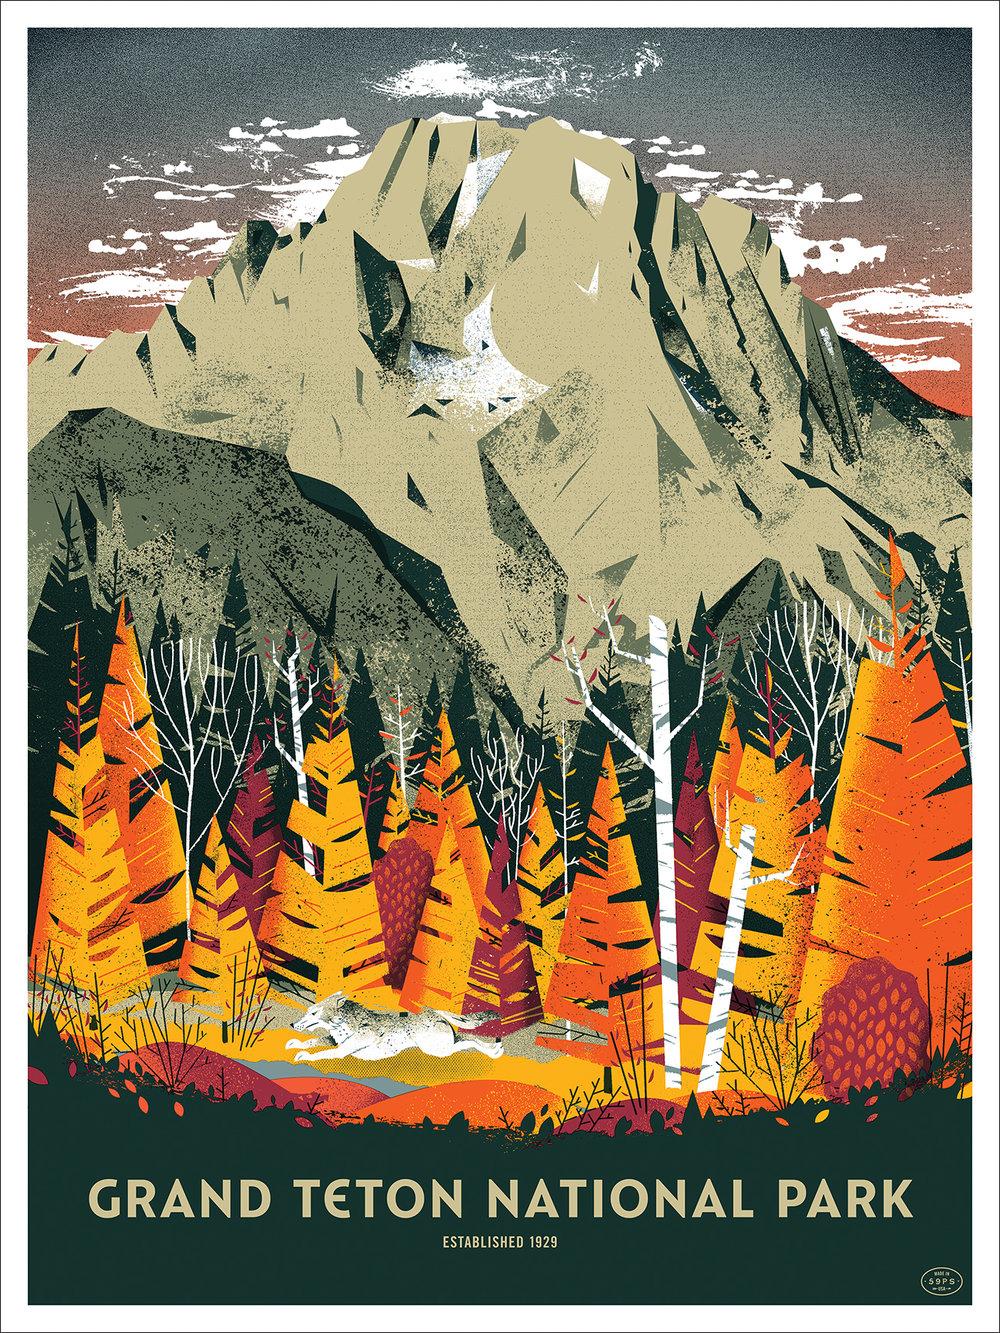 Grand-Teton-National-Park-Eric-Nyffeler-Fifty-Nine-Parks-Print-Series_rgb.jpg